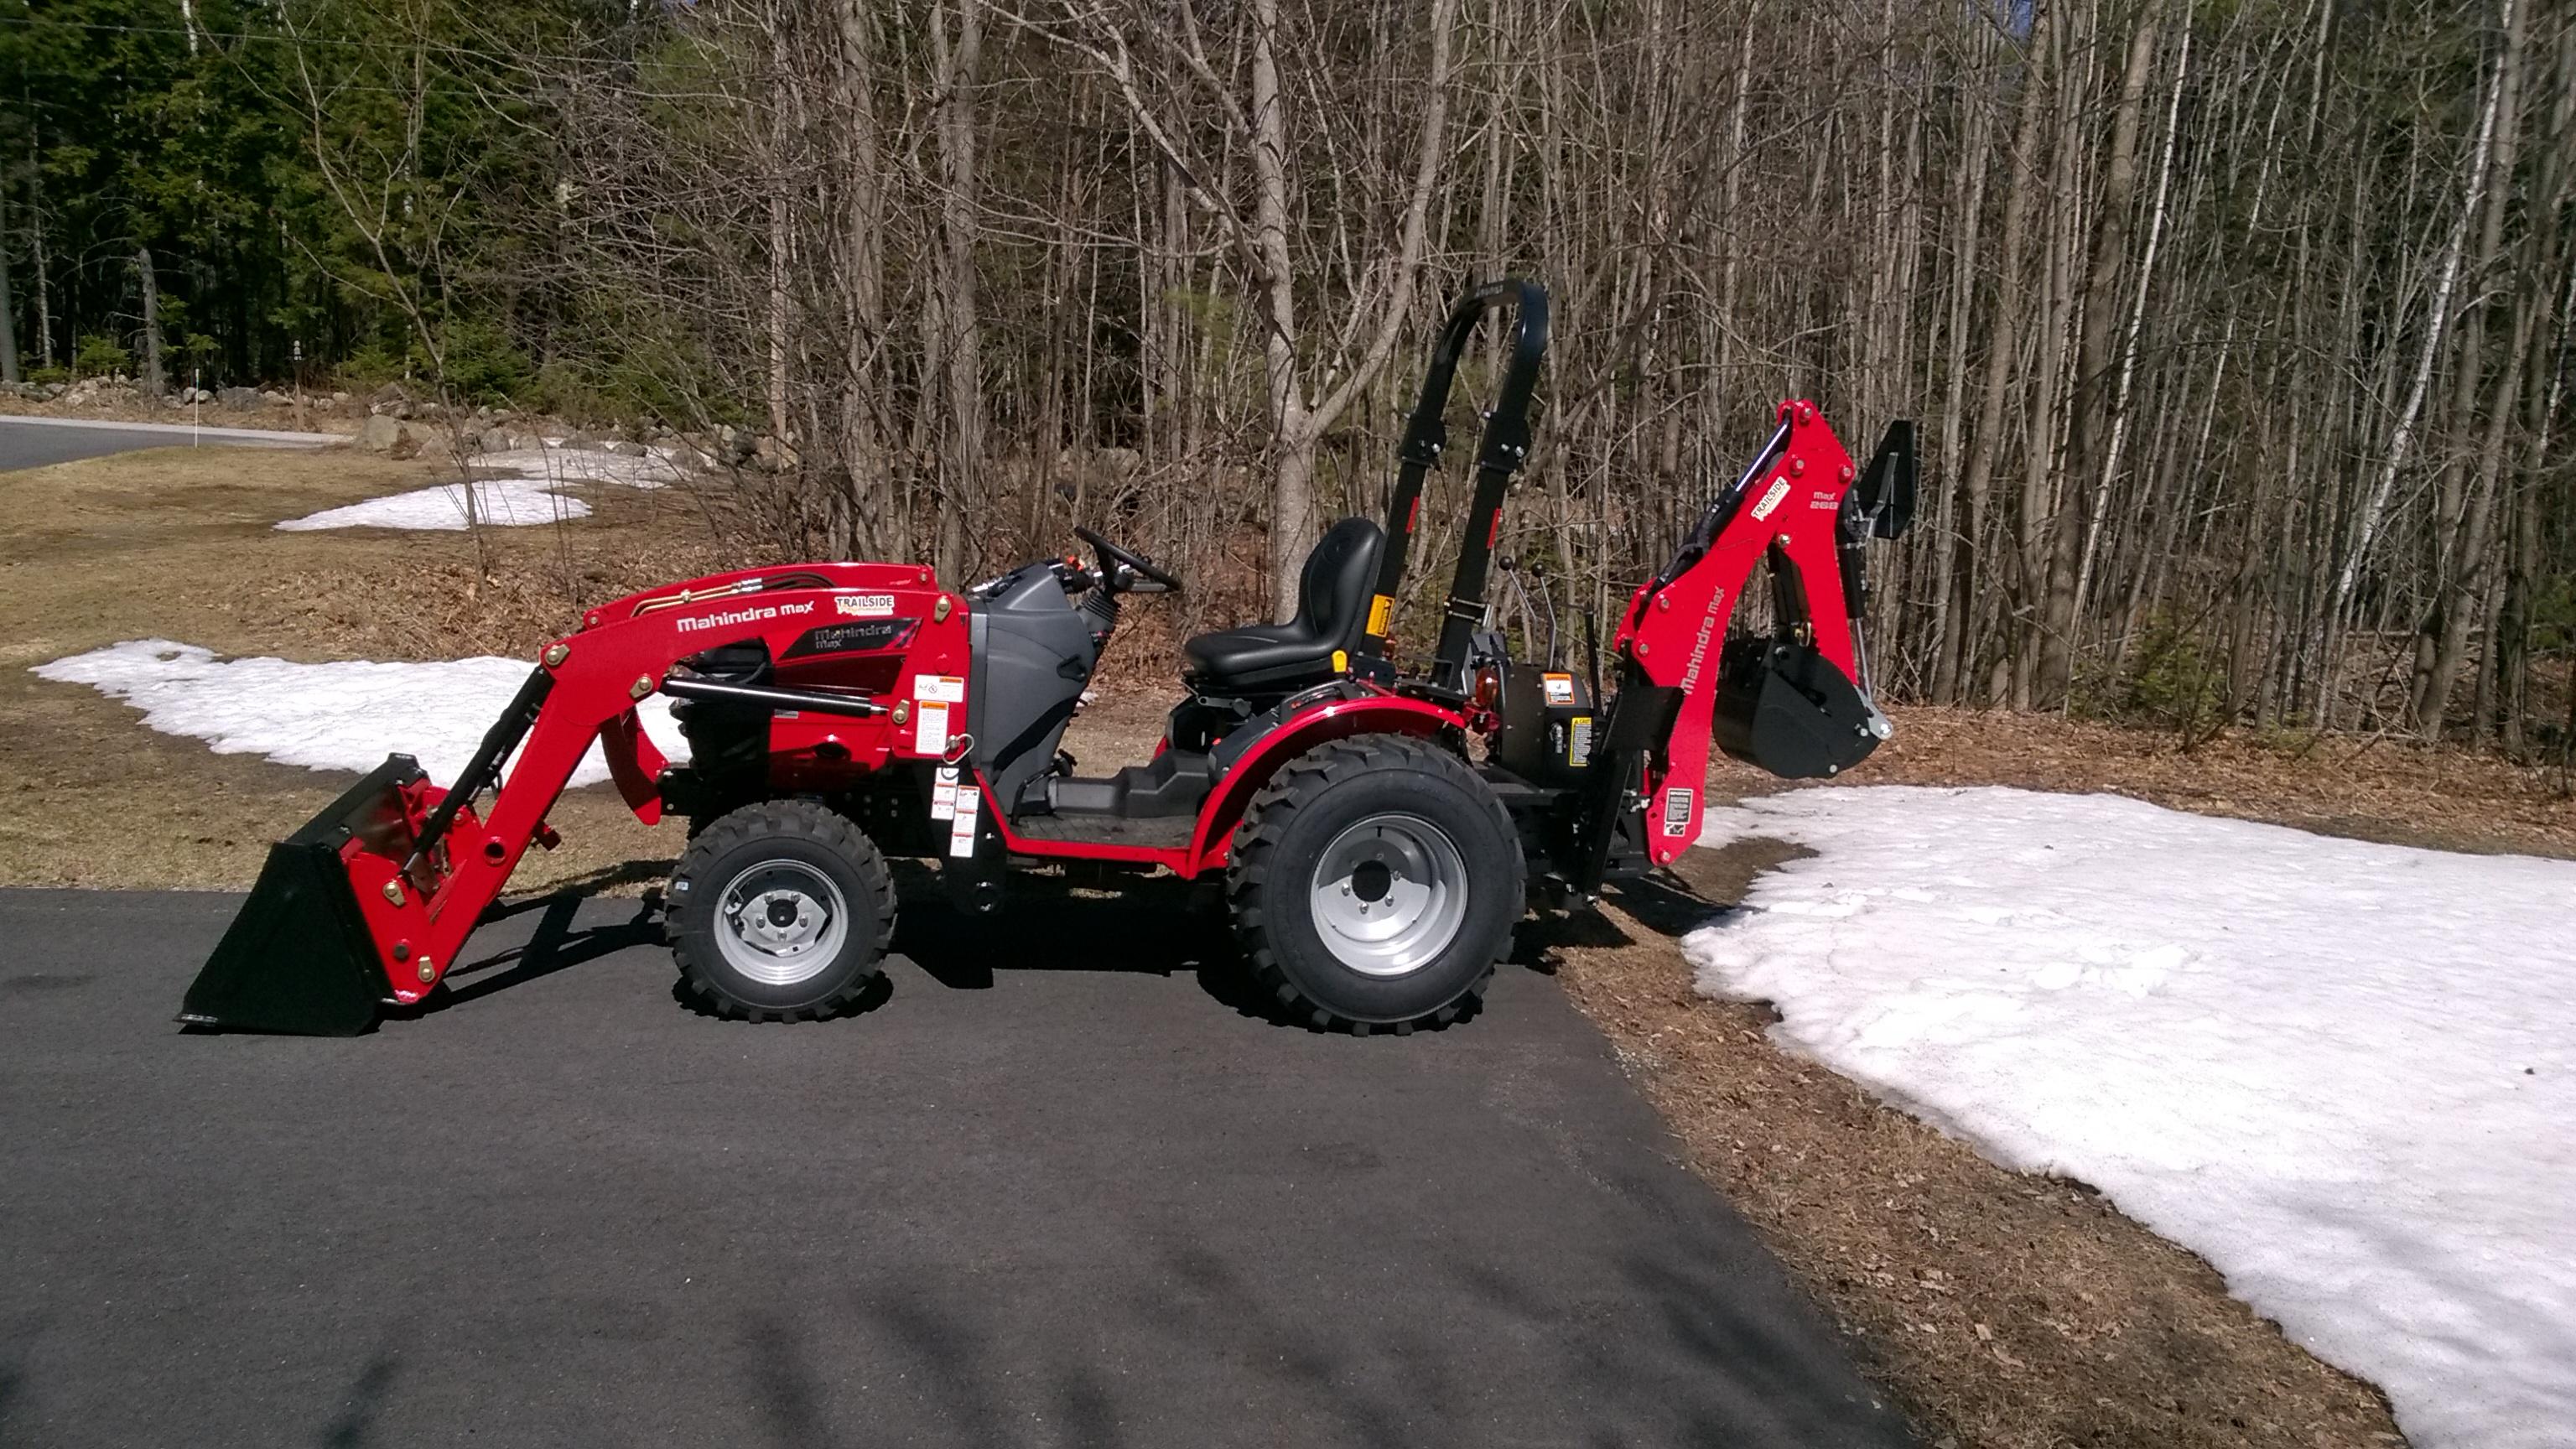 Max 26xl - MyTractorForum com - The Friendliest Tractor